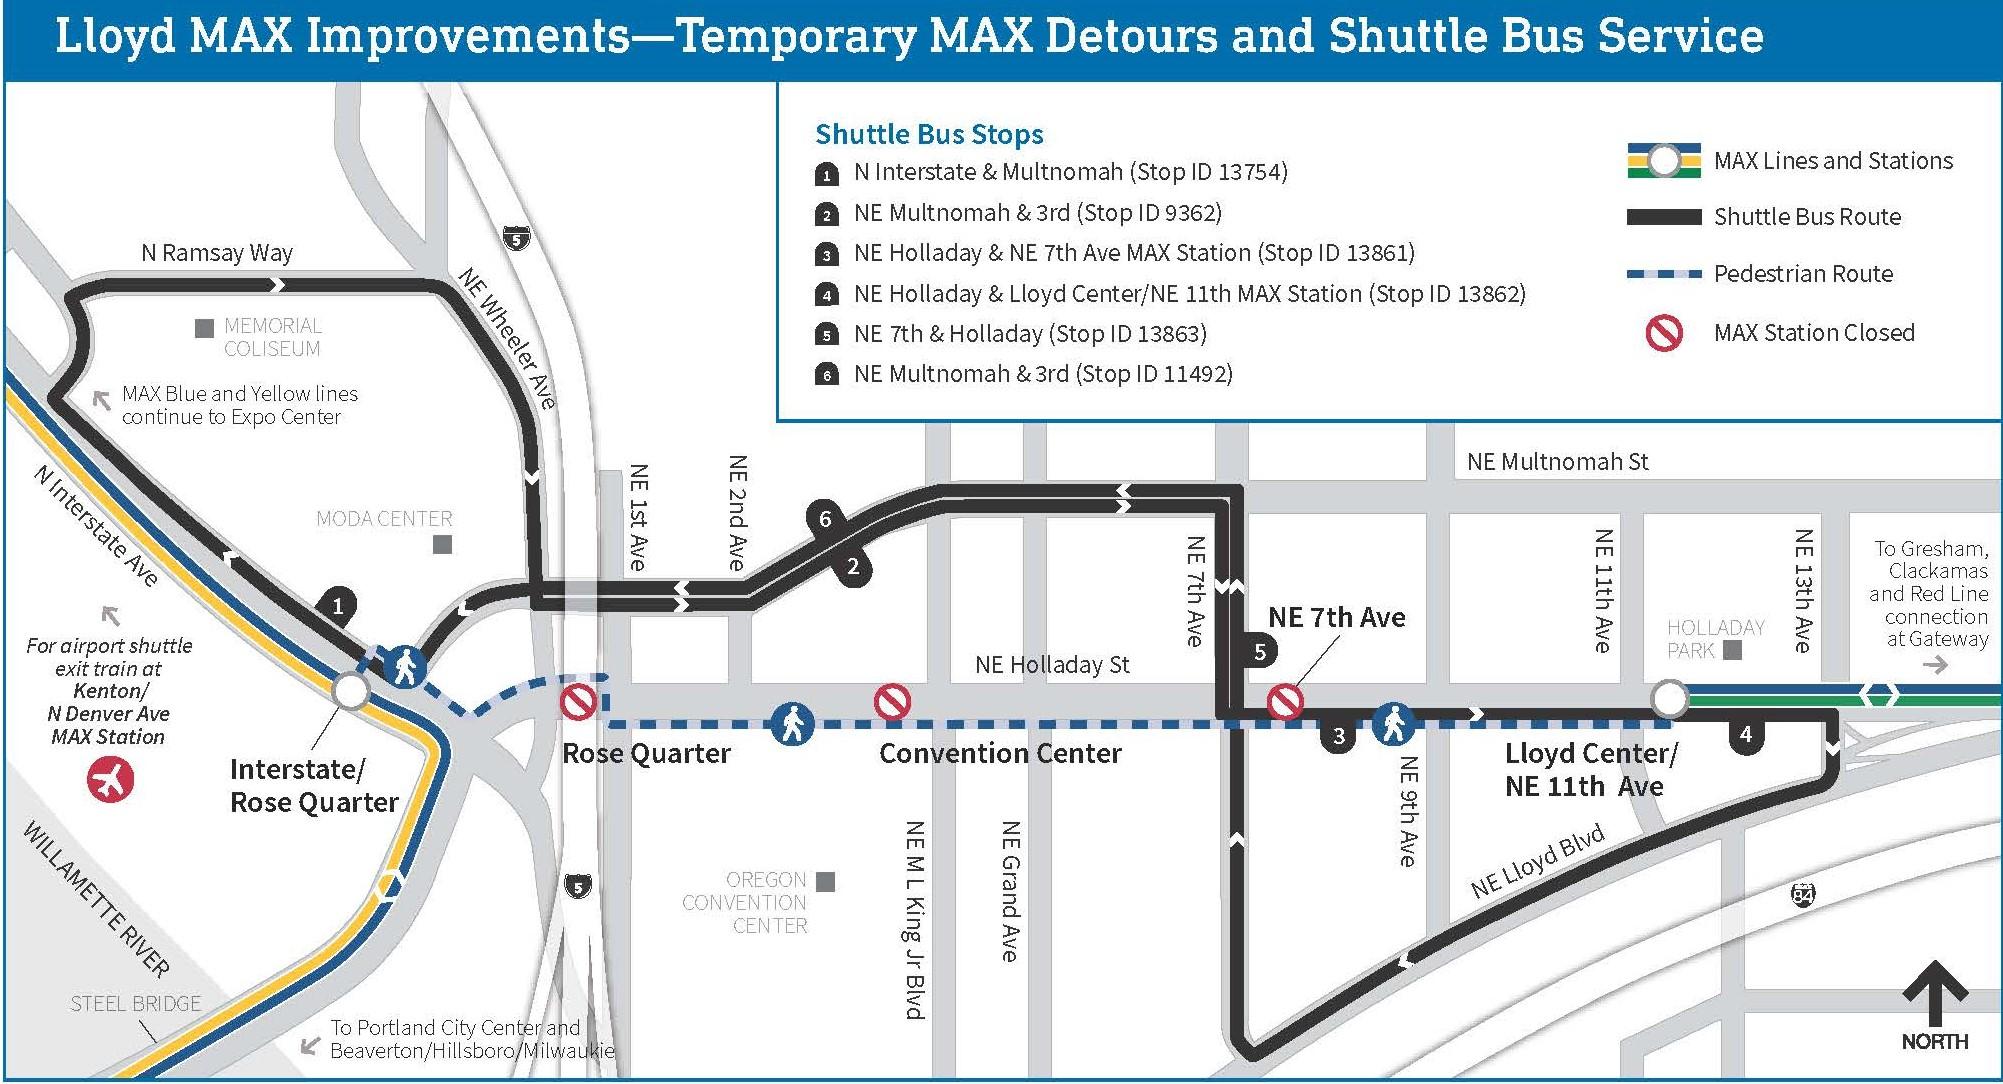 2019-07 Lloyd-MAX-Improvements-Lloyd-area-shuttle-bus-route.jpg